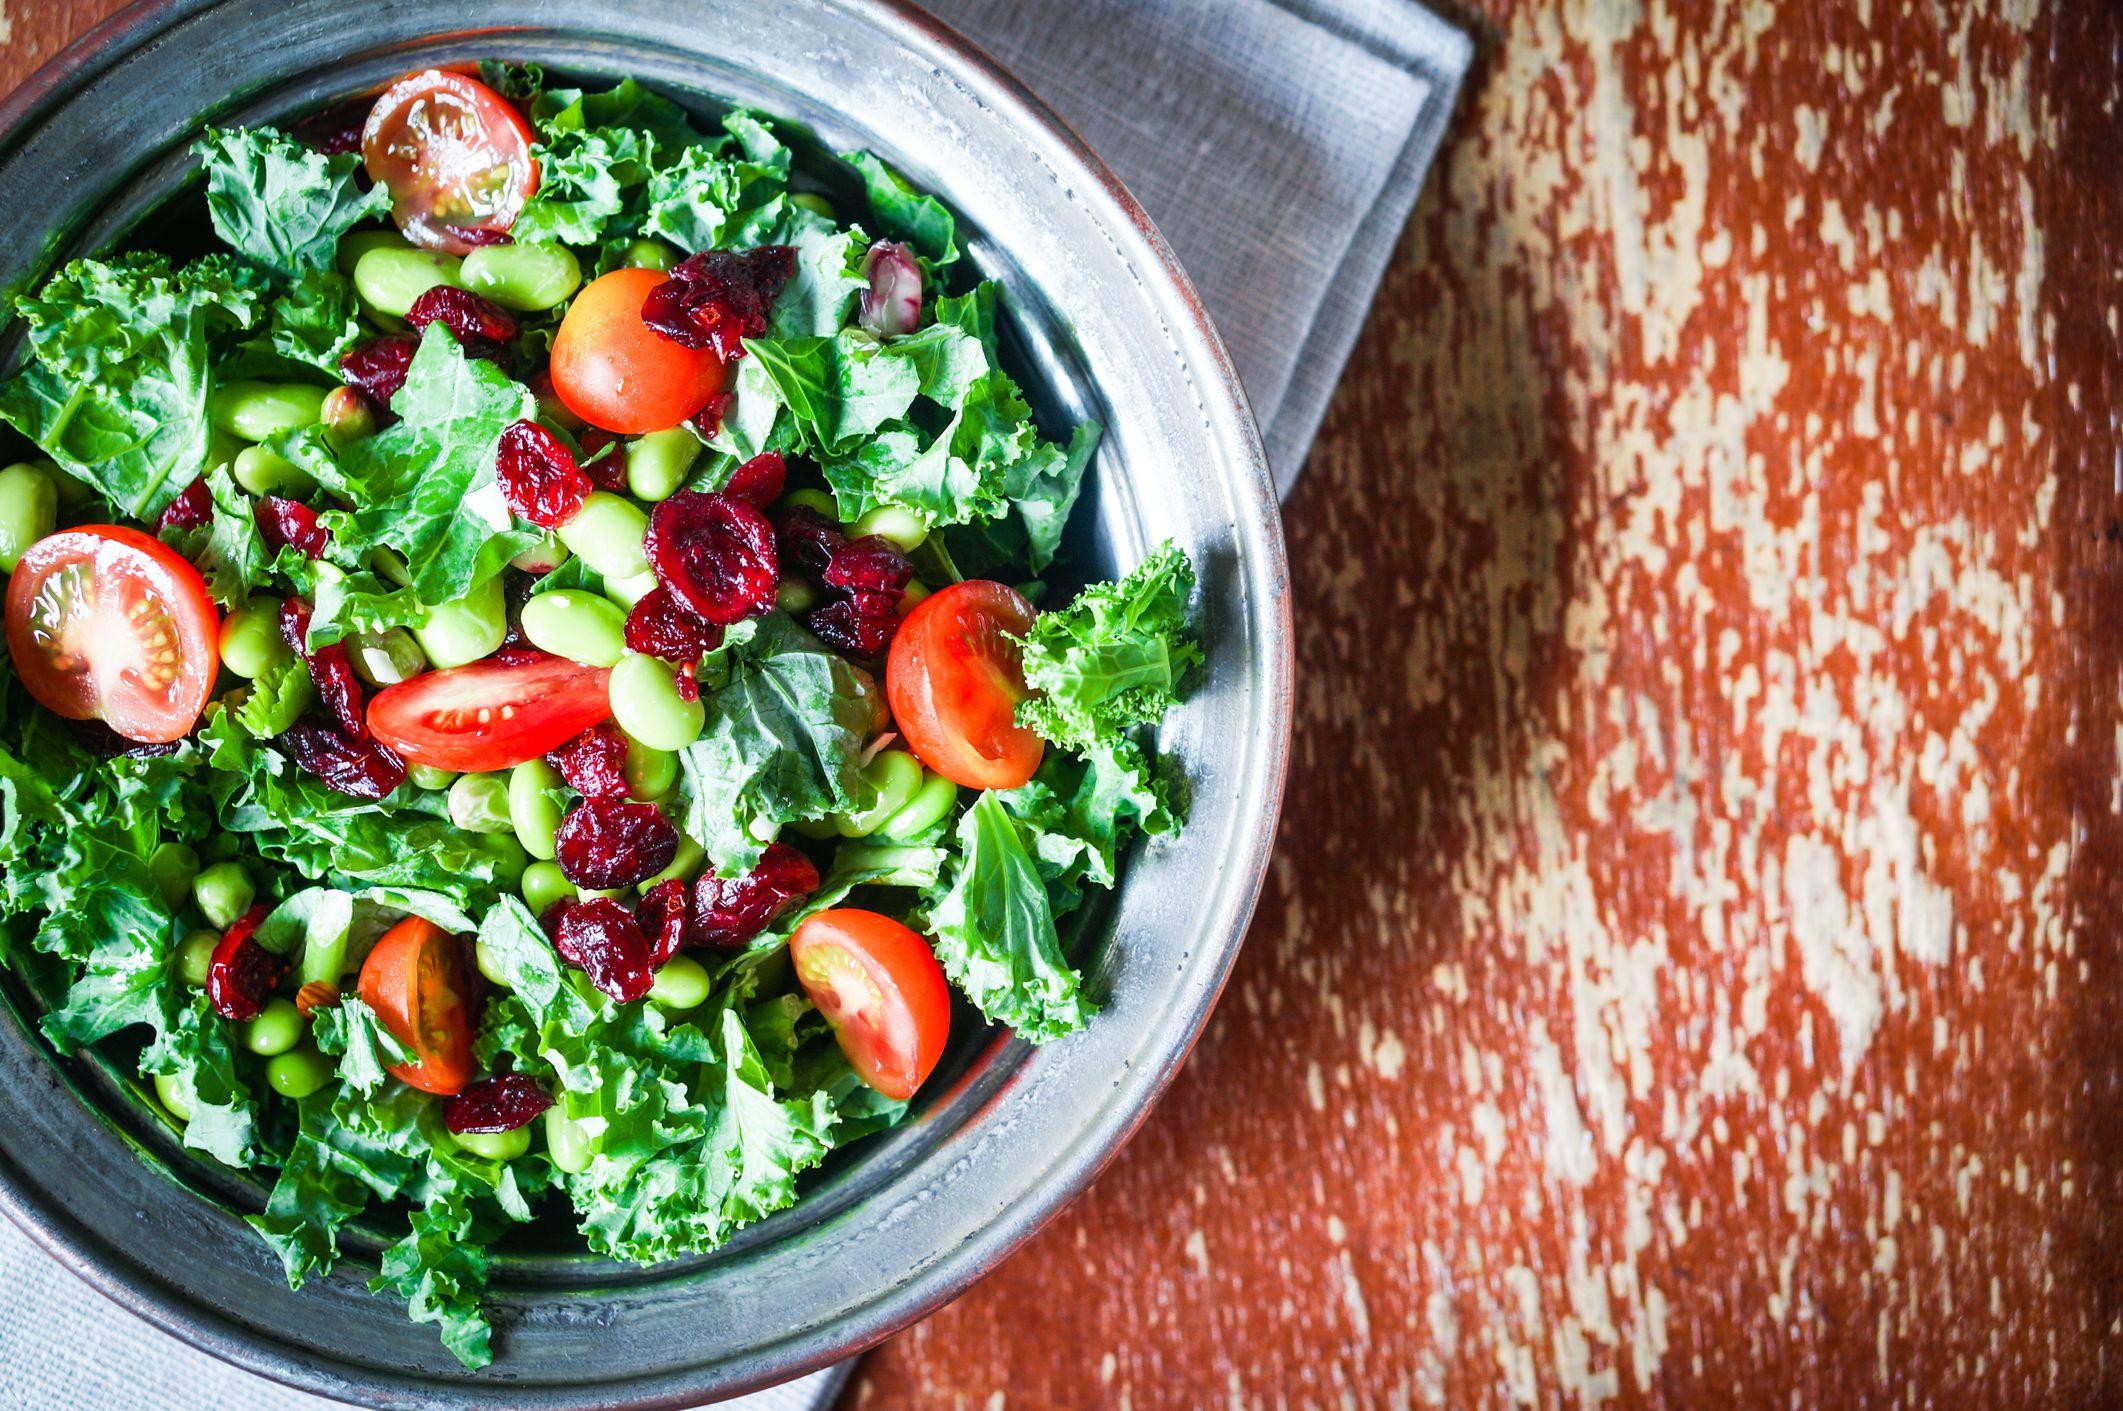 Salade met edamame boontjes